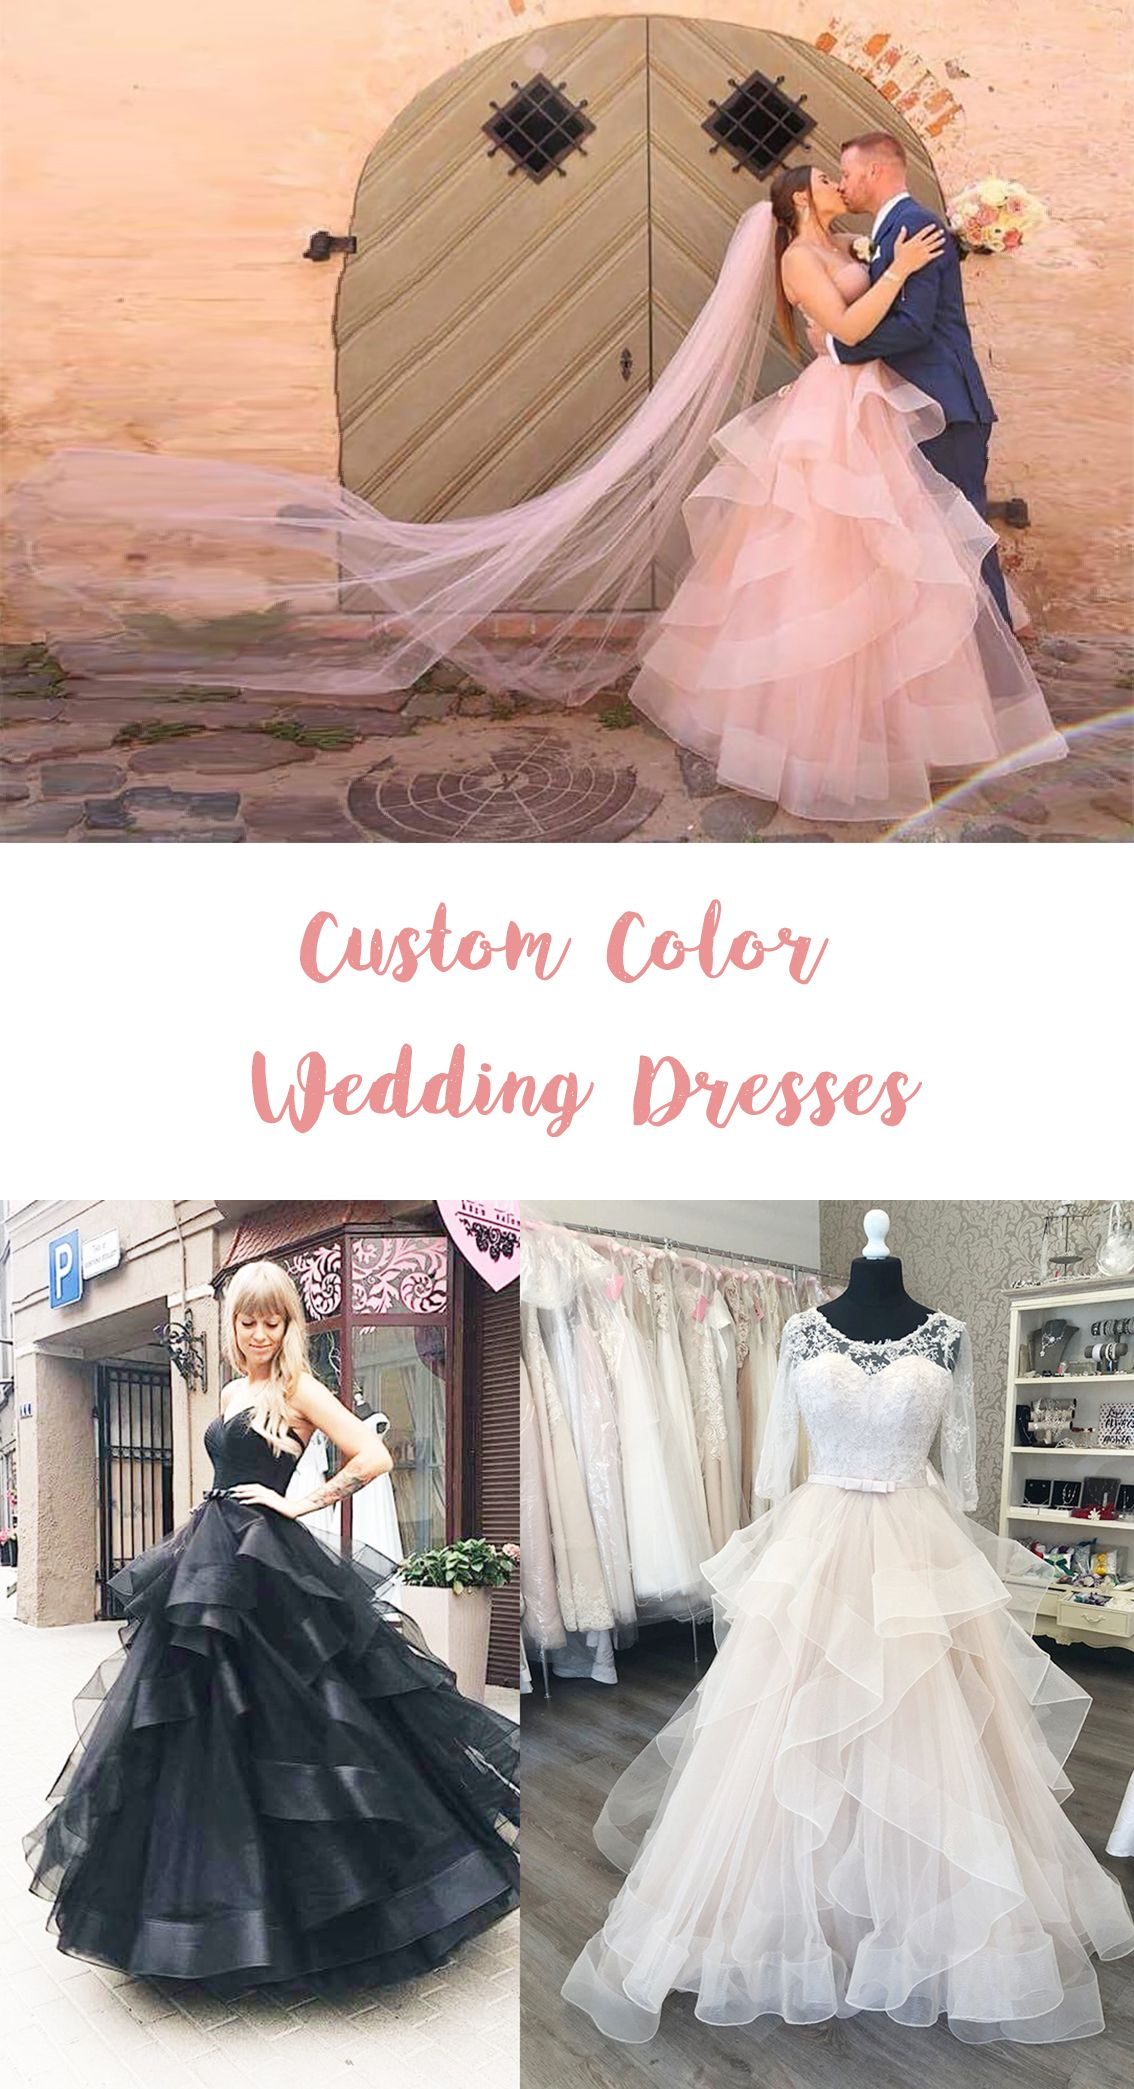 Custom color beach wedding dresses red black gray light blue pink